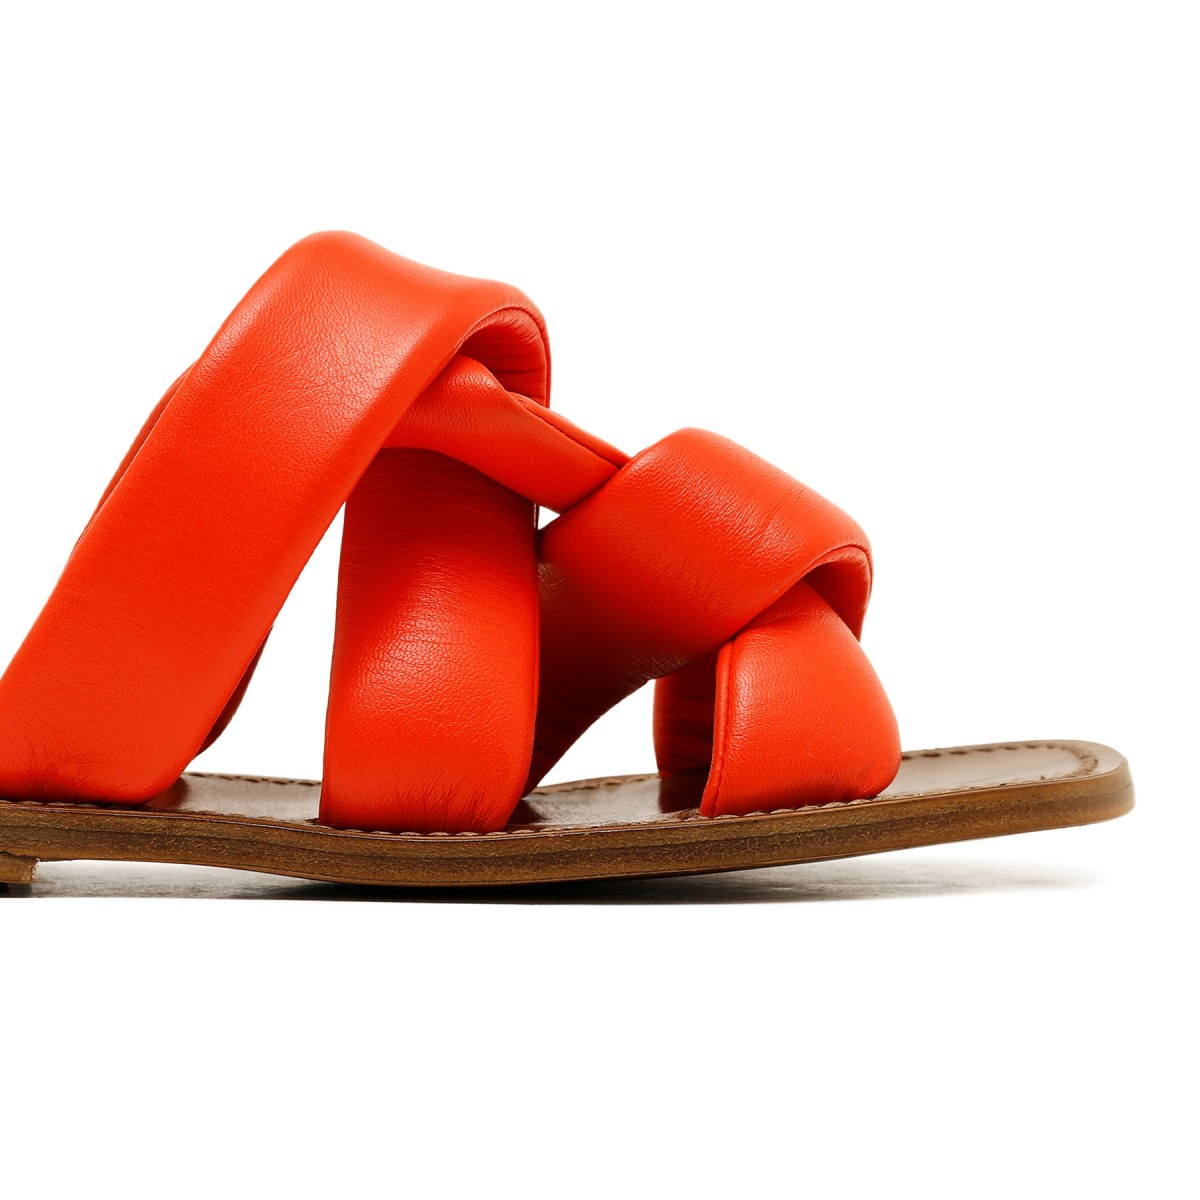 Red leather slide sandals